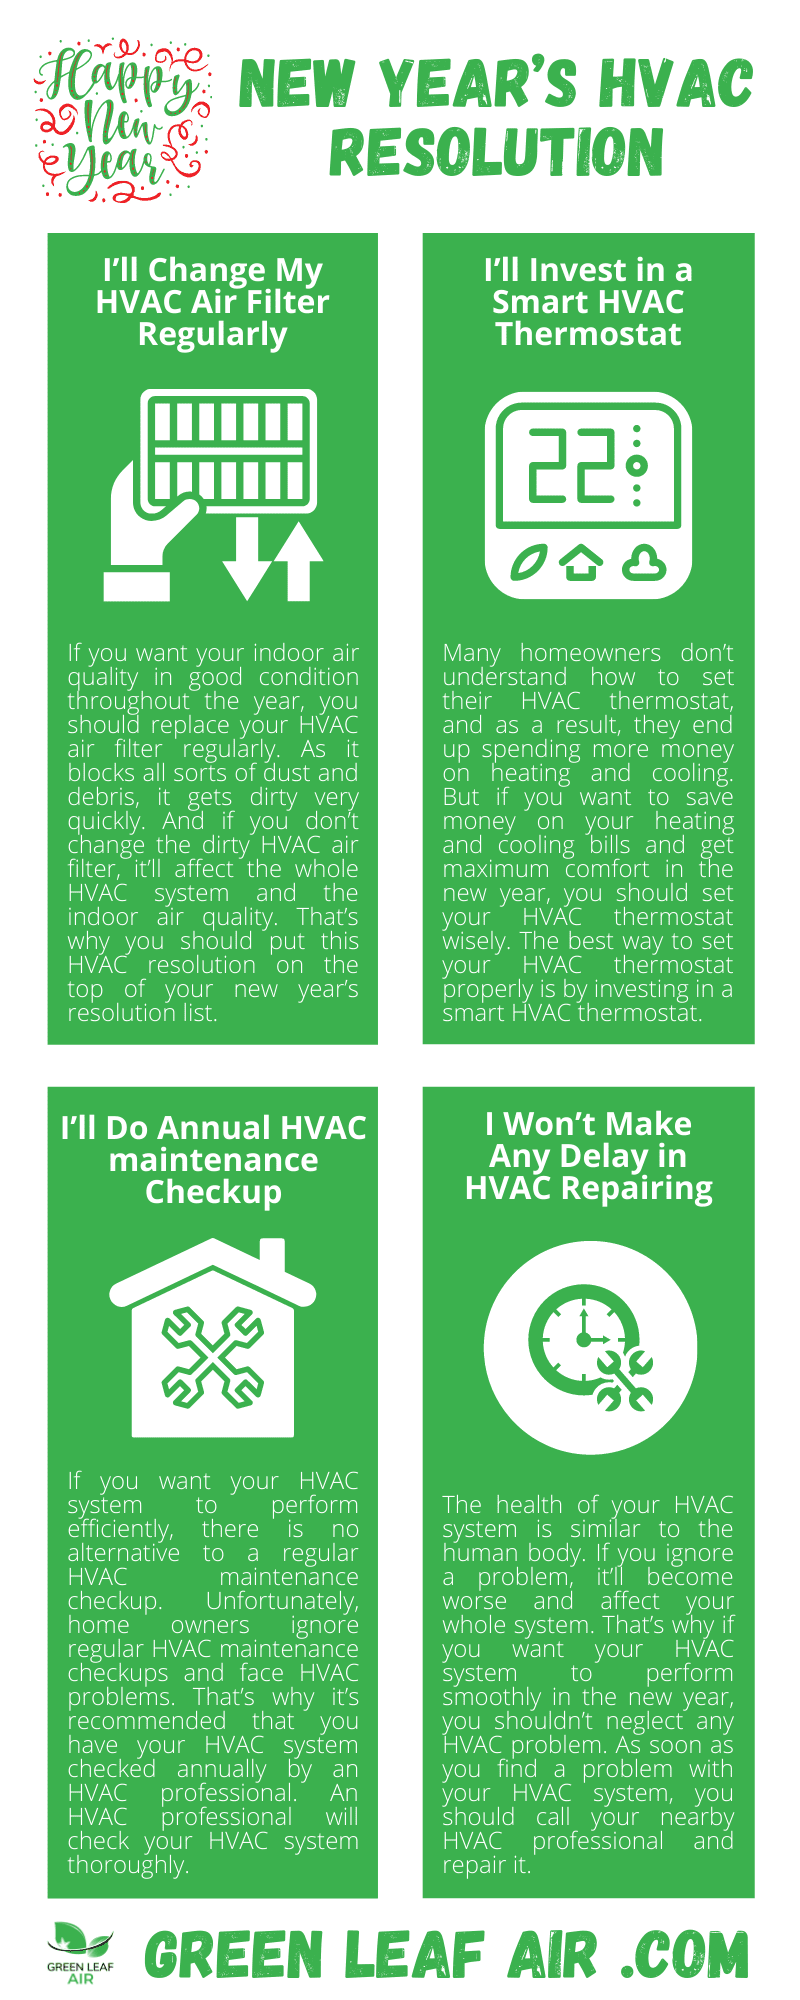 New Year's HVAC Resolution